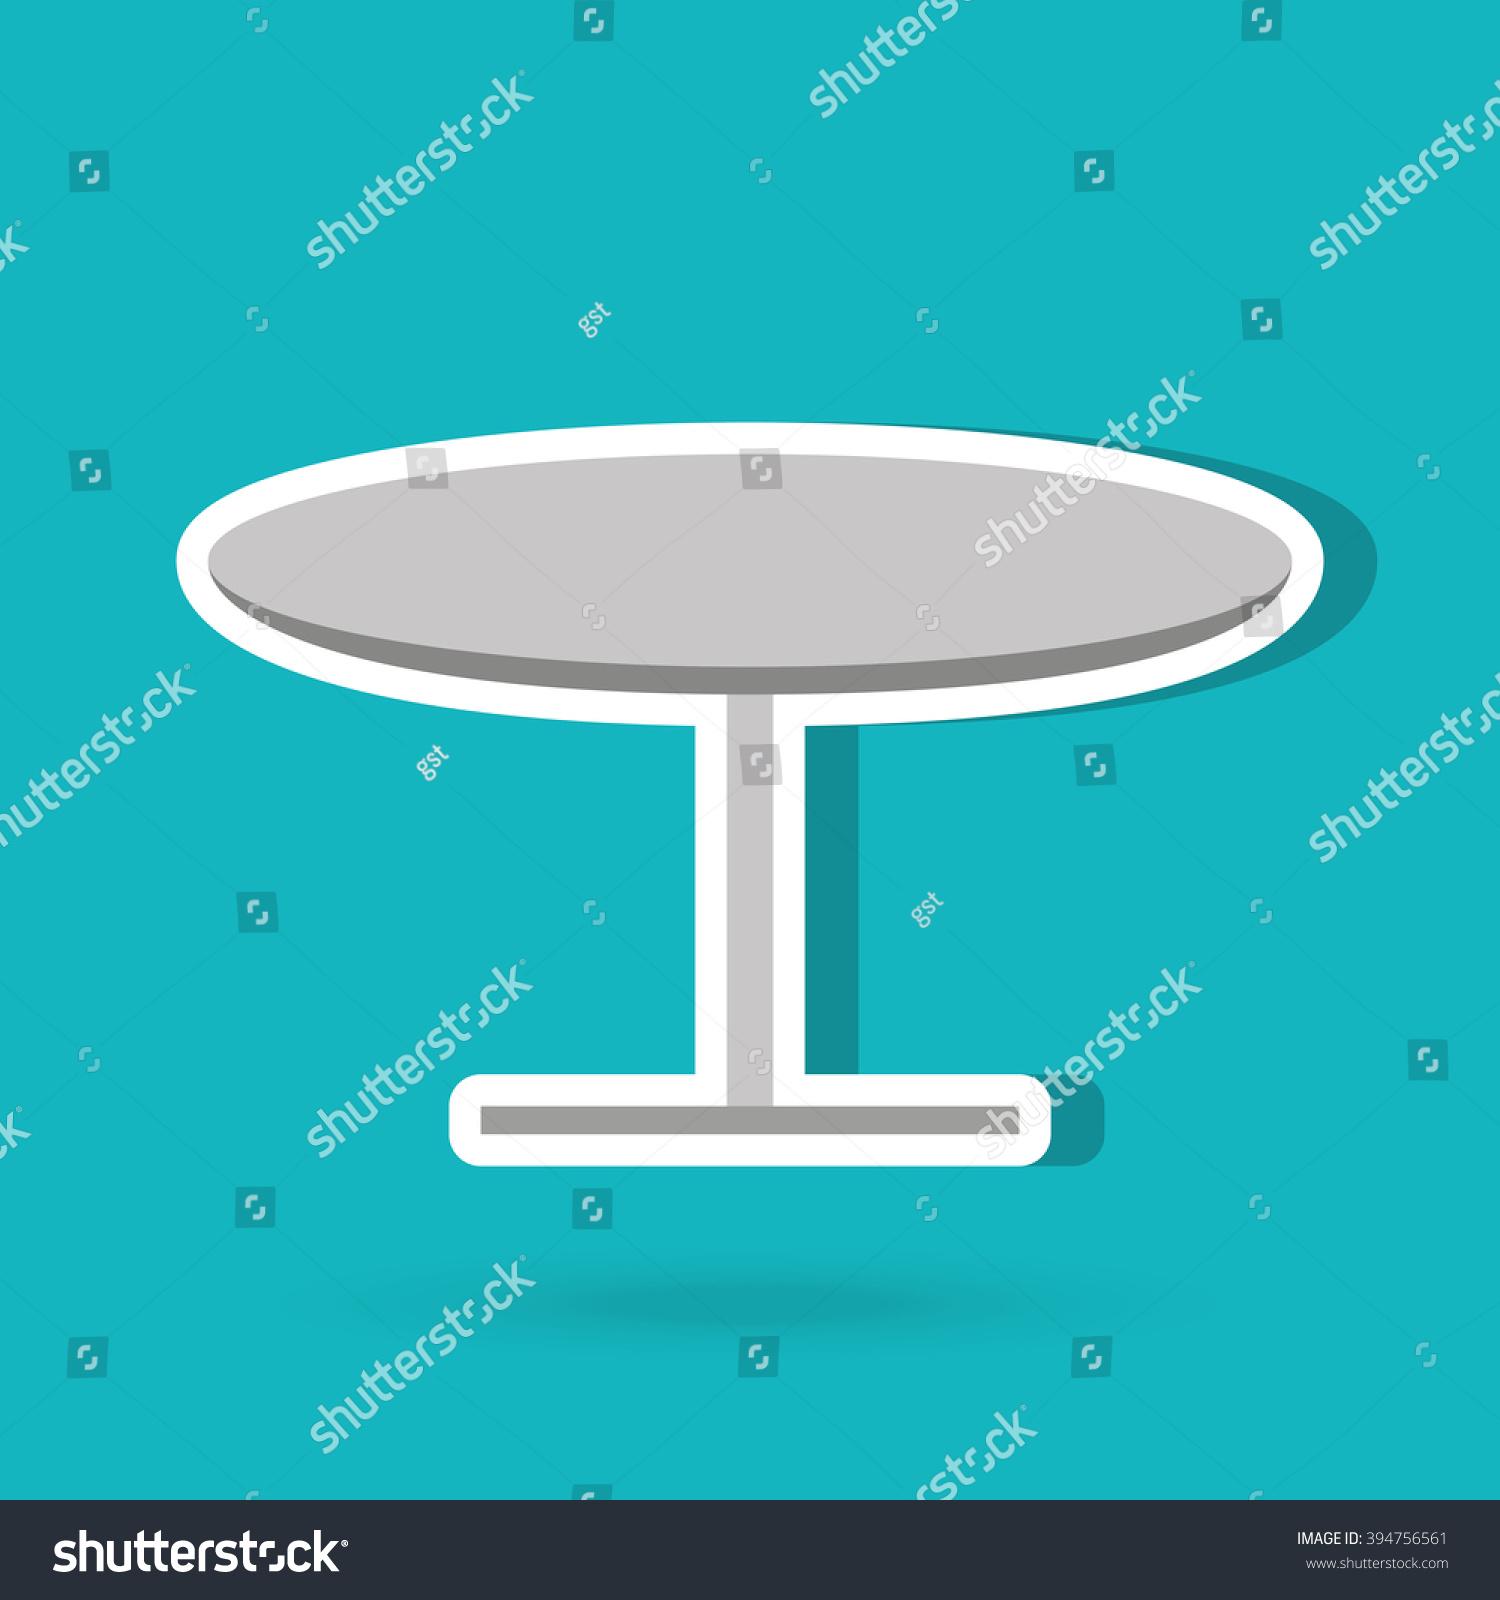 Round table design stock vector 394756561 shutterstock for Table design vector